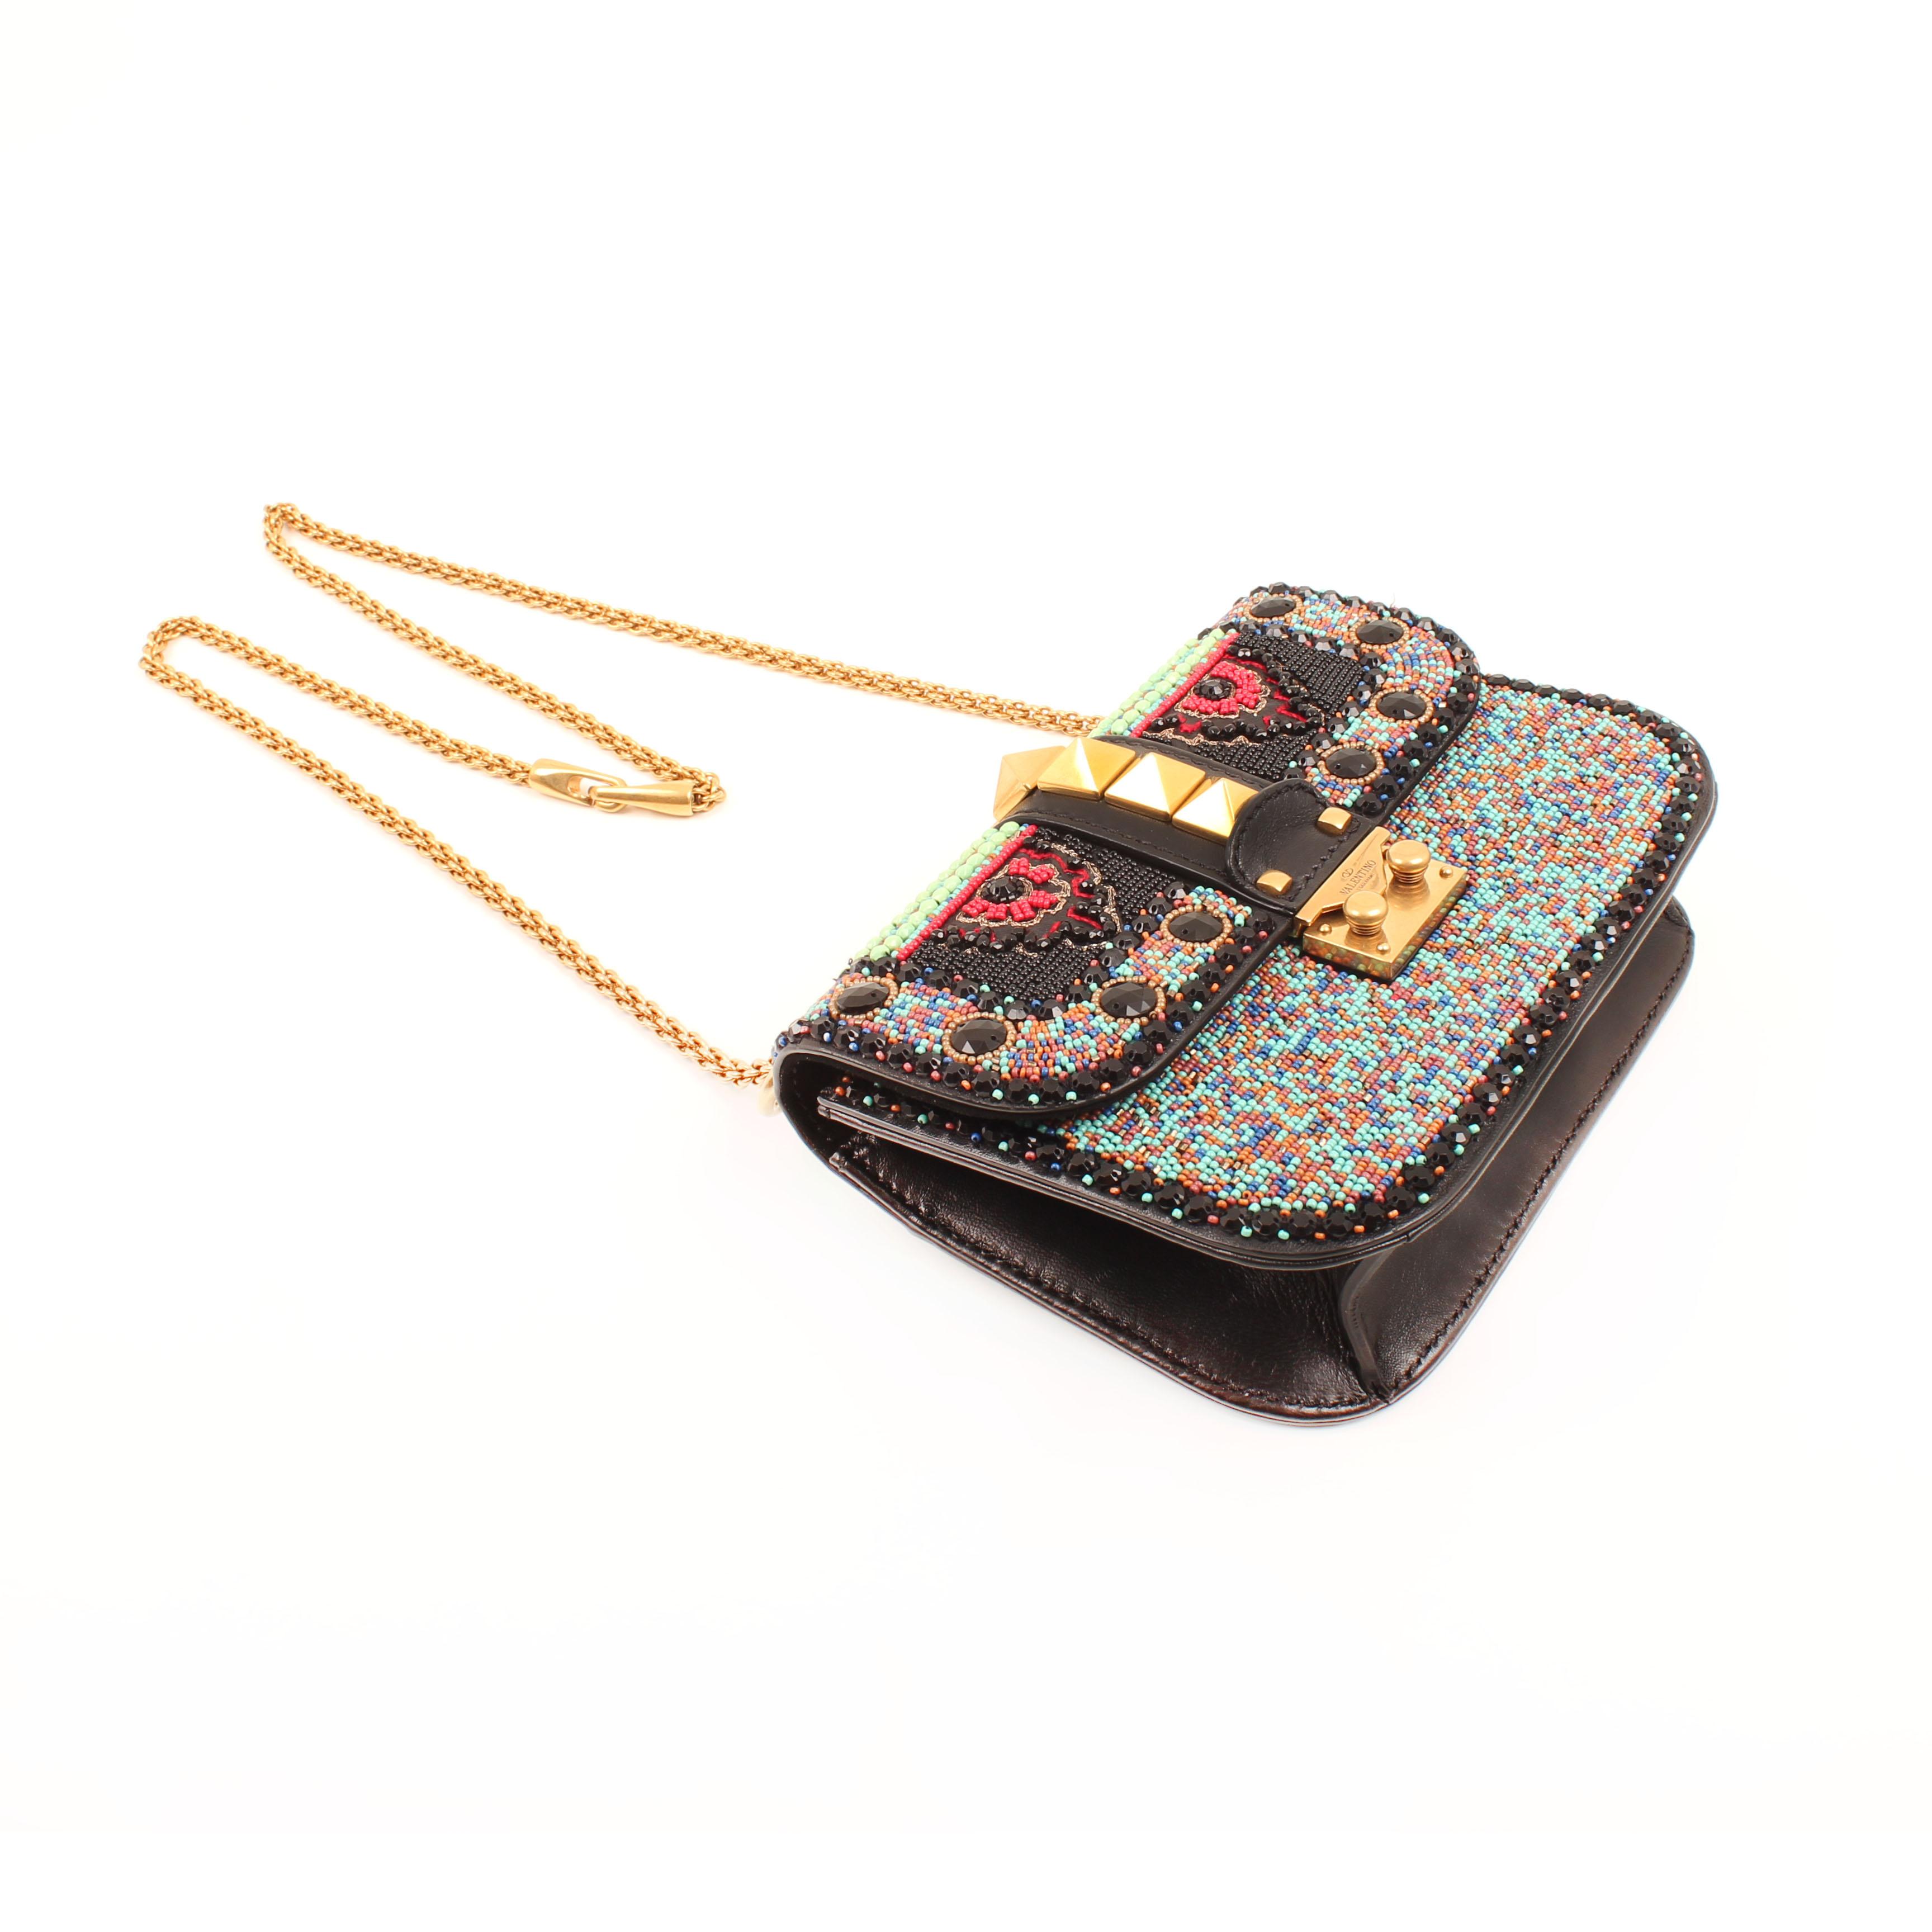 crossbody bag valentino glam lock rockstud beaded multicolor chain